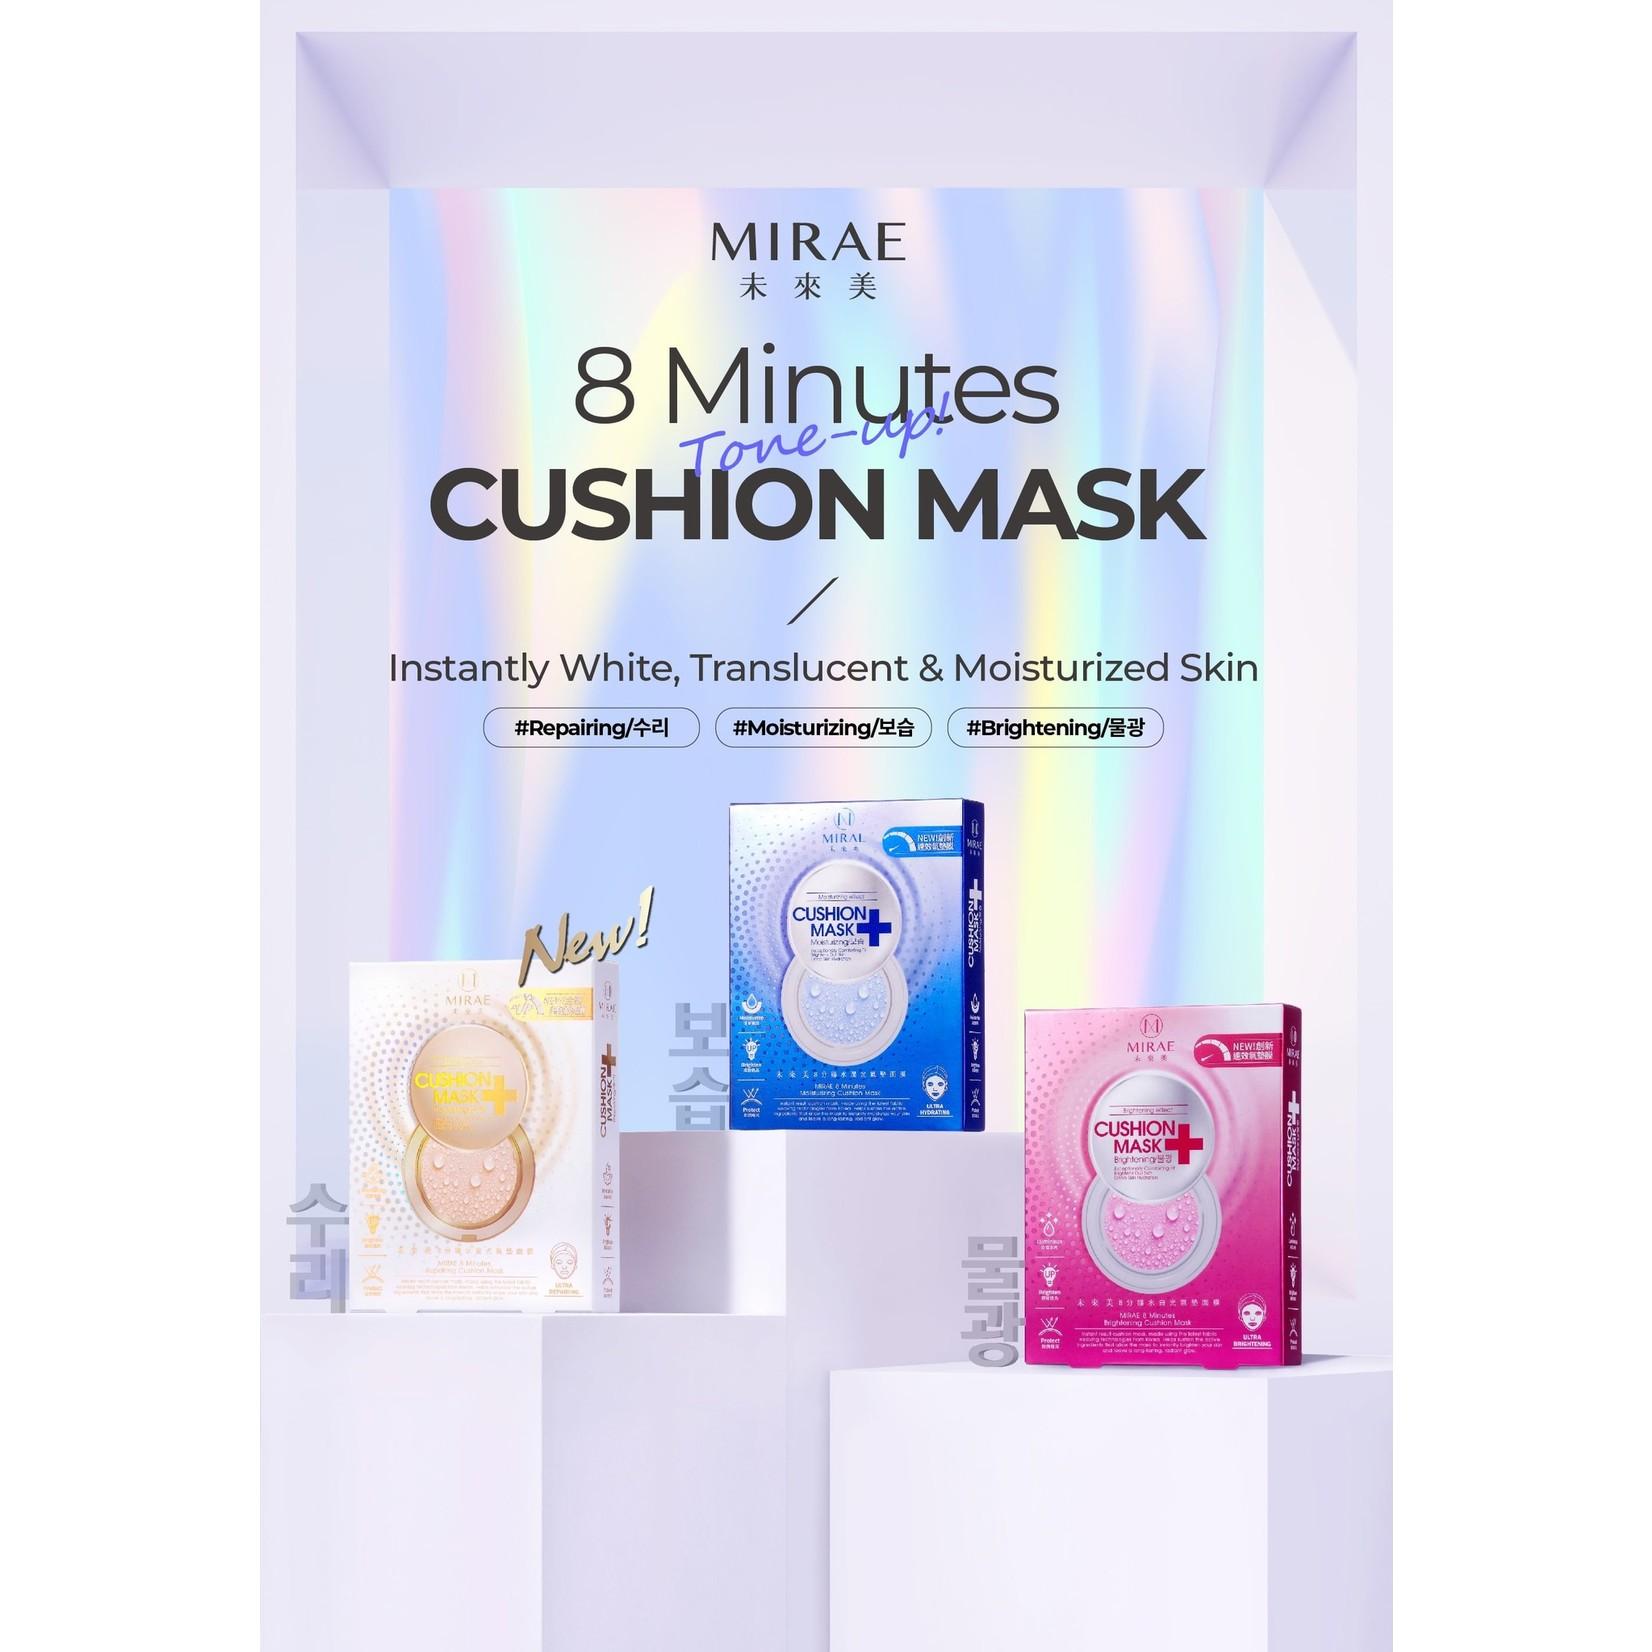 MIRAE 8 Minutes Repairing Cushion Mask